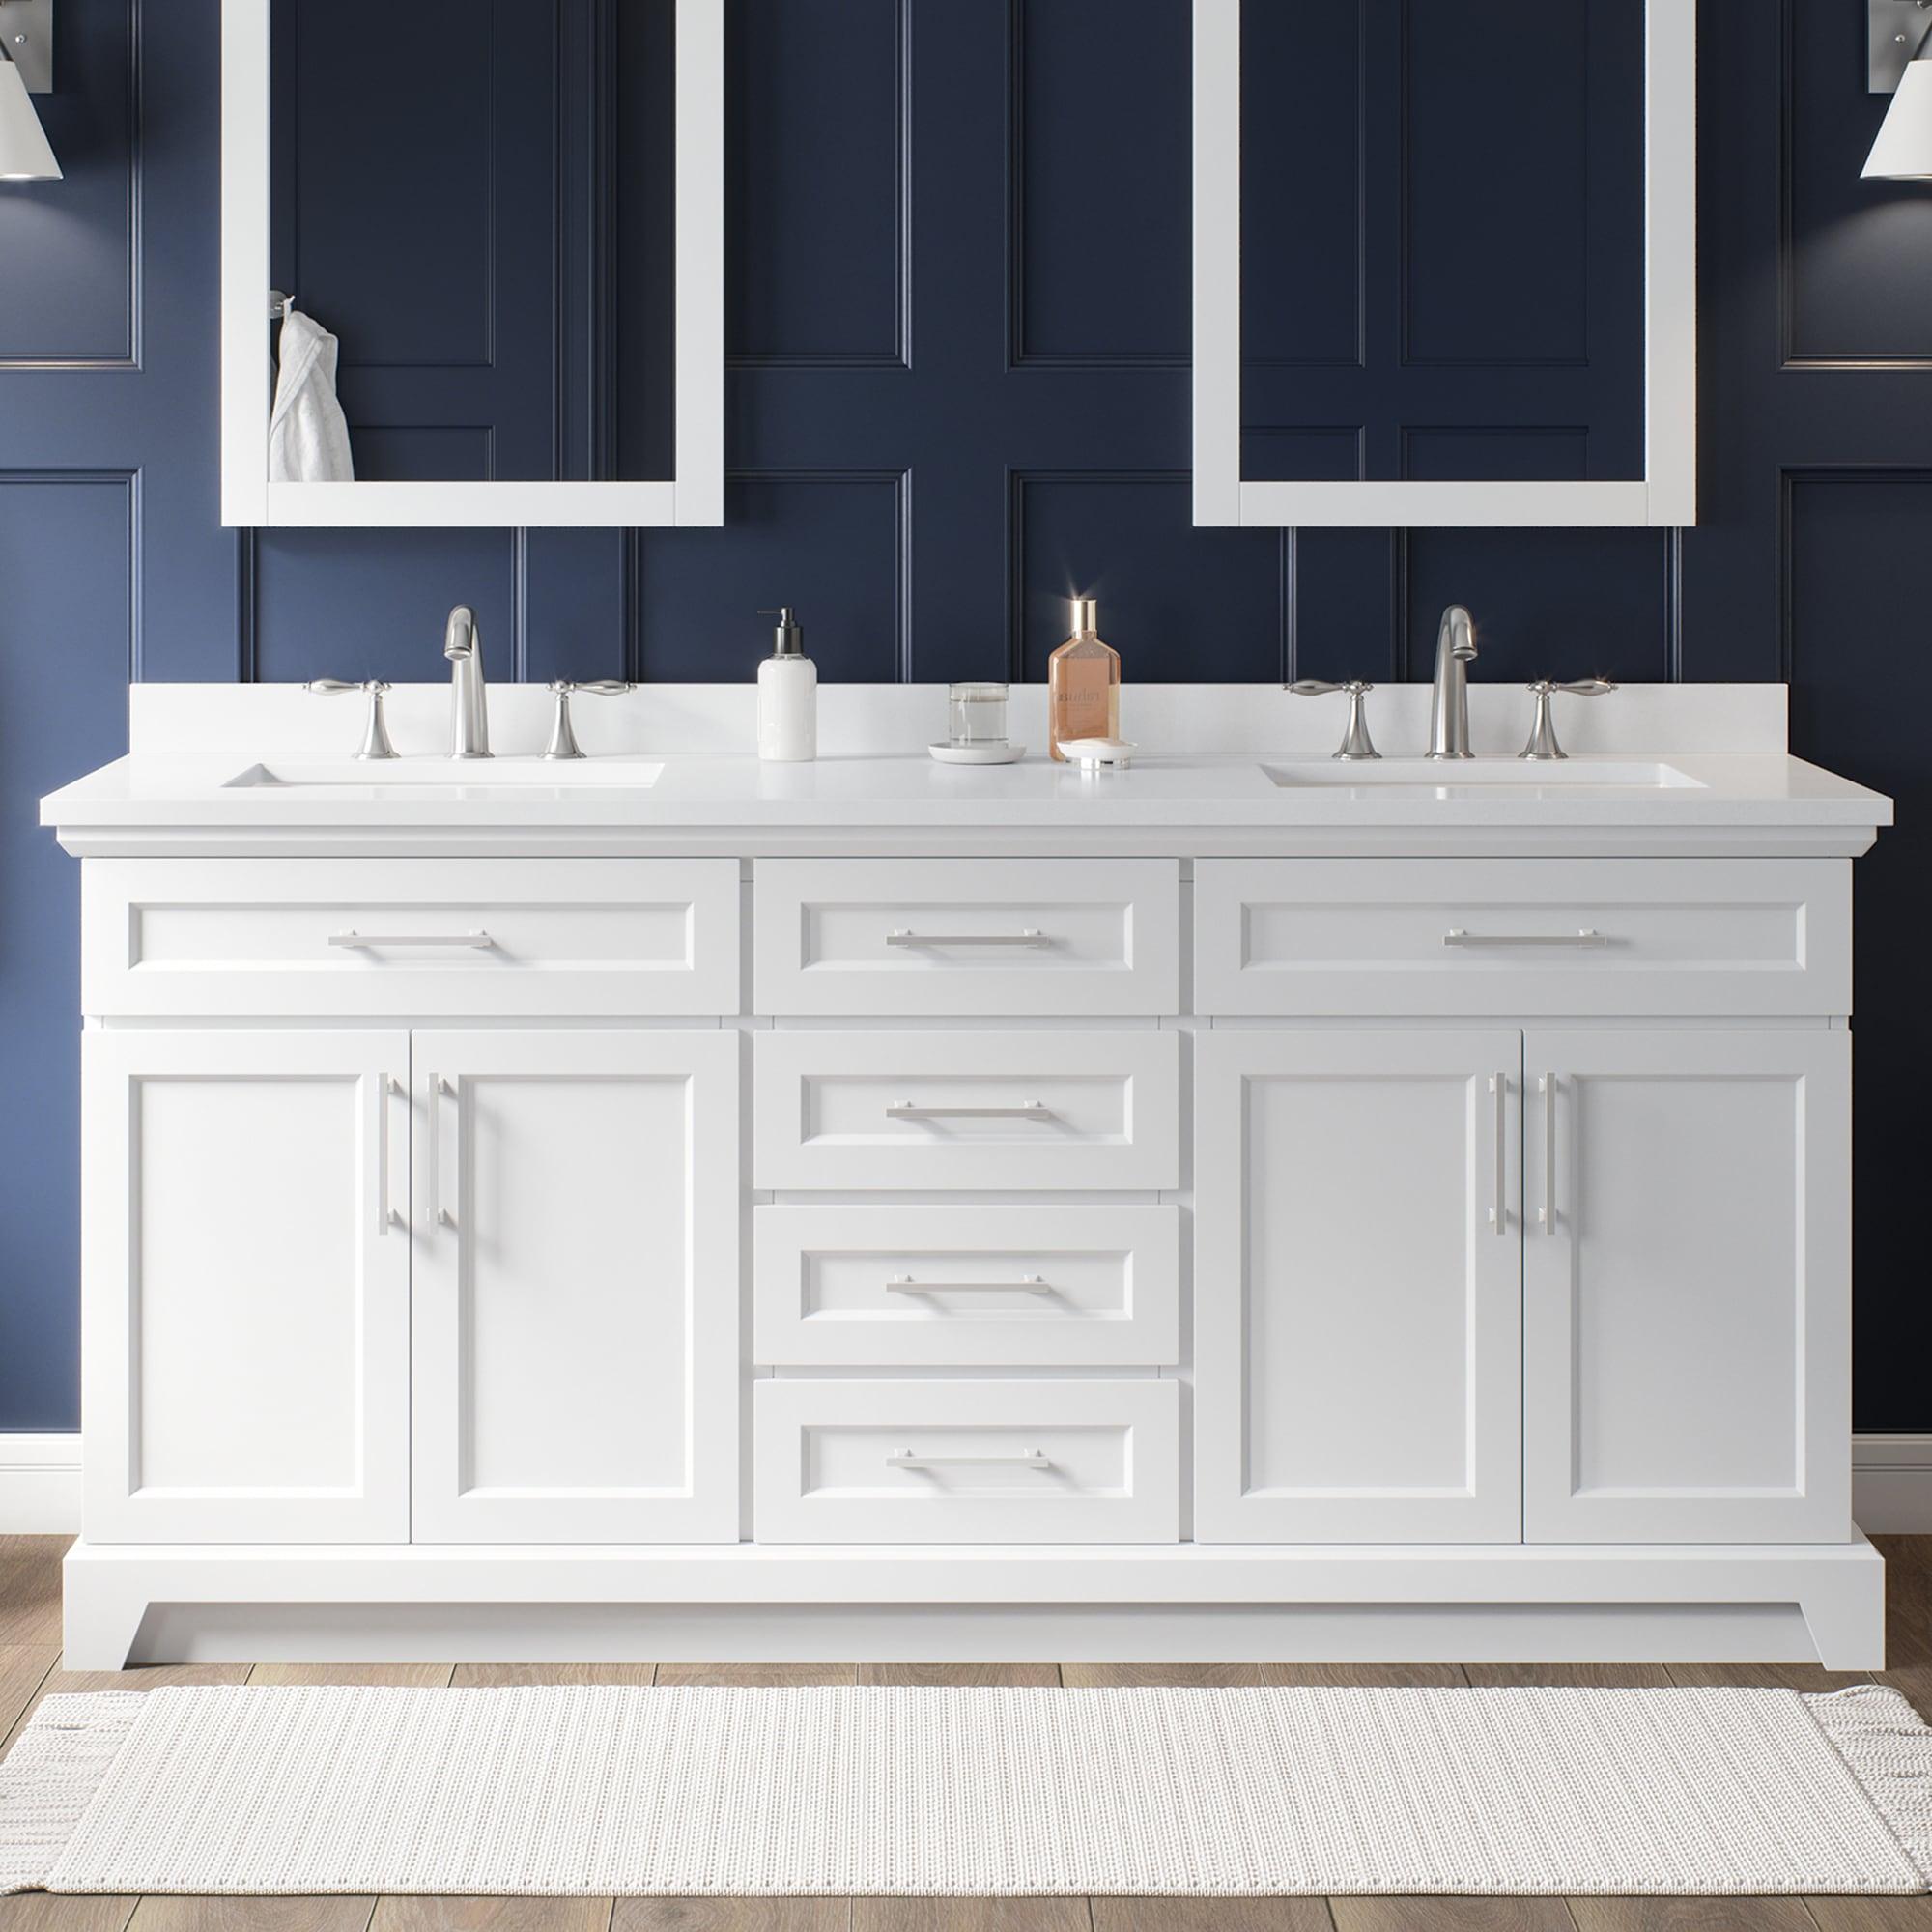 allen + roth Felix 20 in White Undermount Double Sink Bathroom Vanity with  White Engineered Stone Top